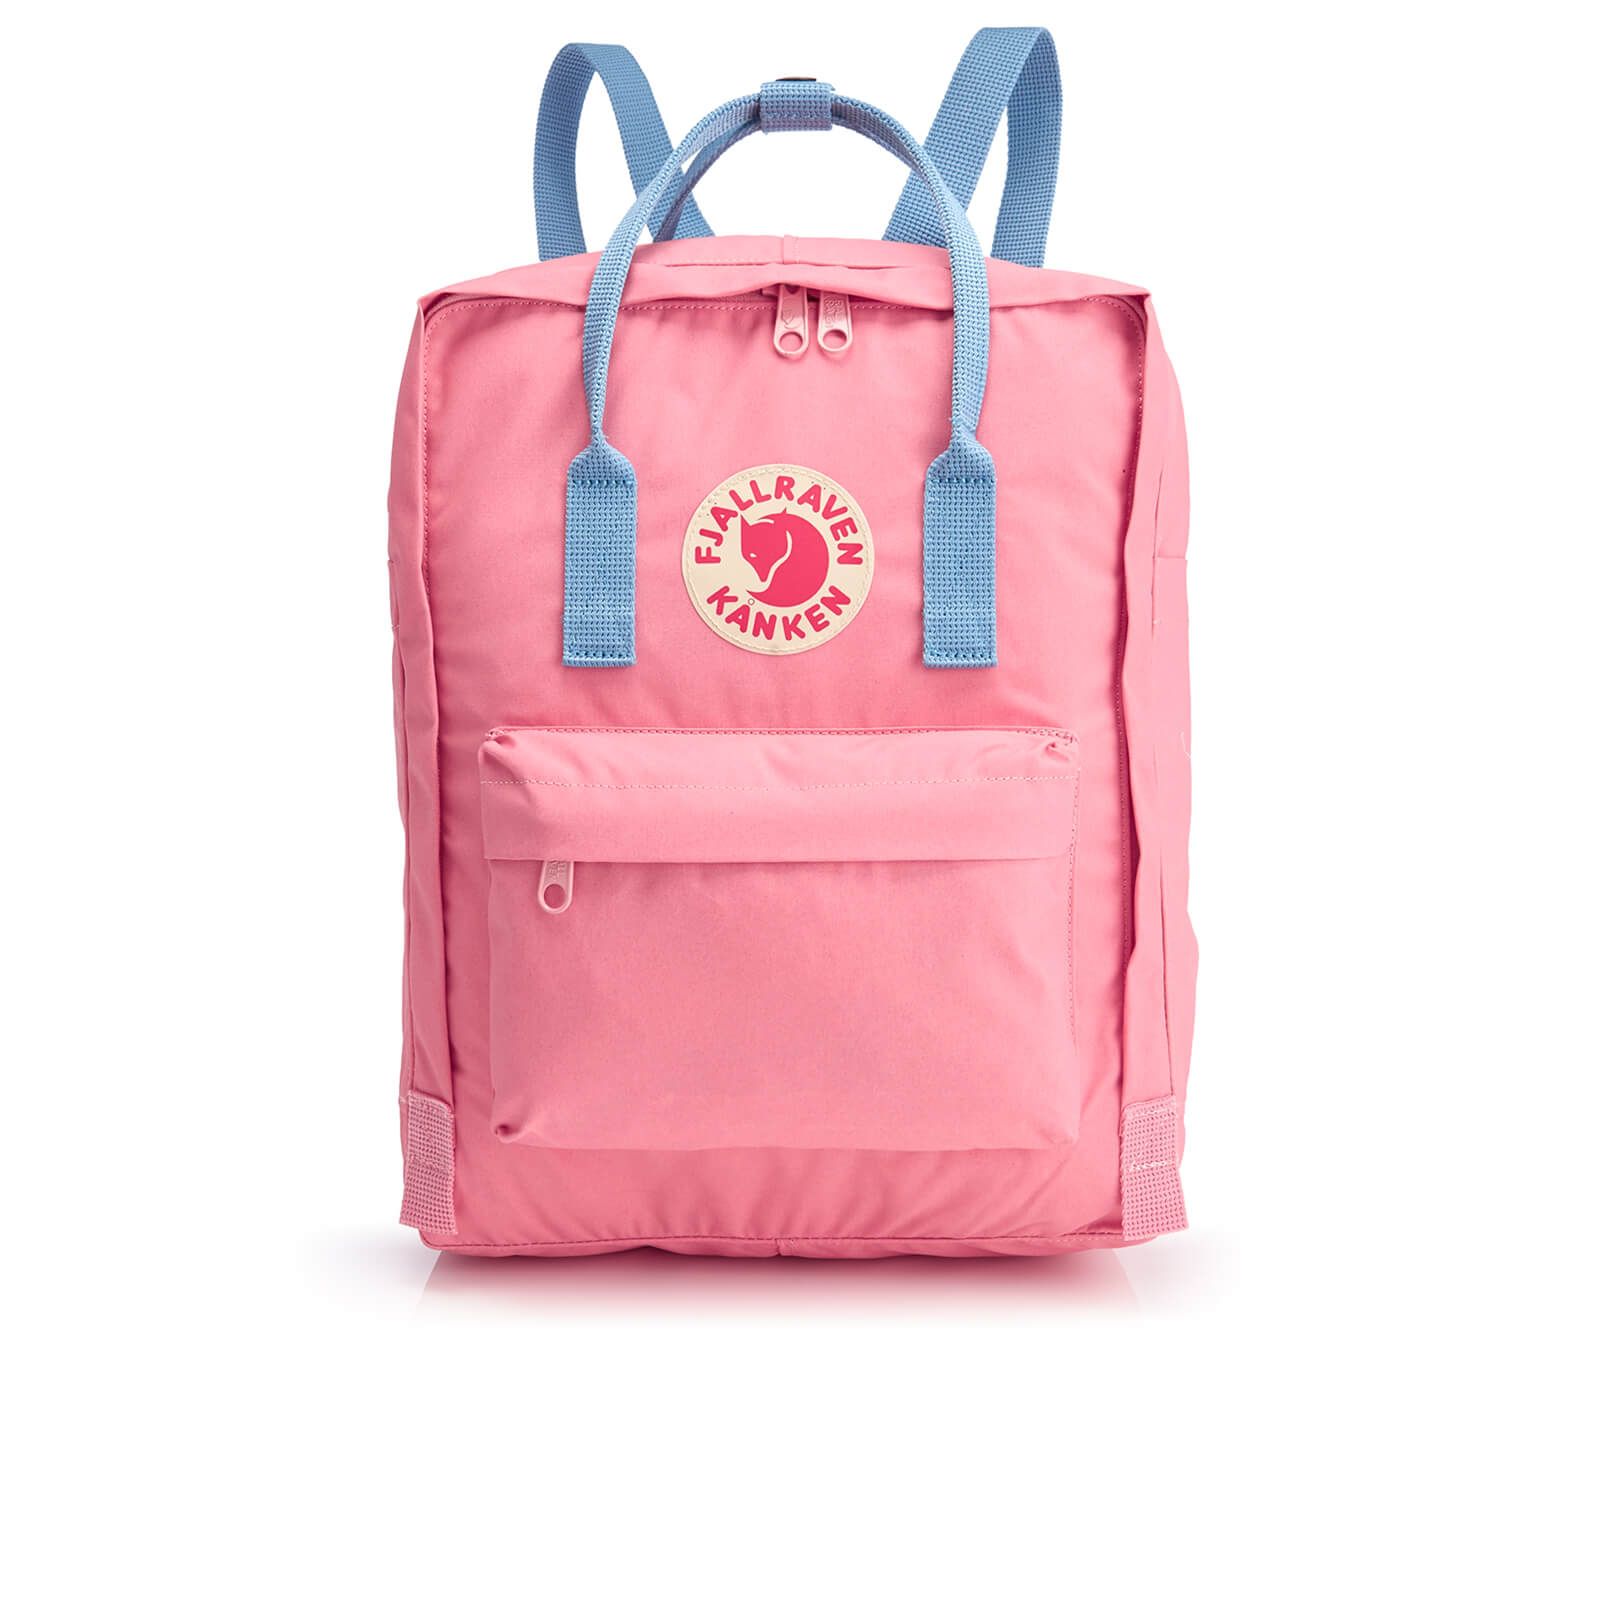 fe0b5b8d8bd Fjallraven Kanken Backpack - Pink Air Blue Mens Accessories